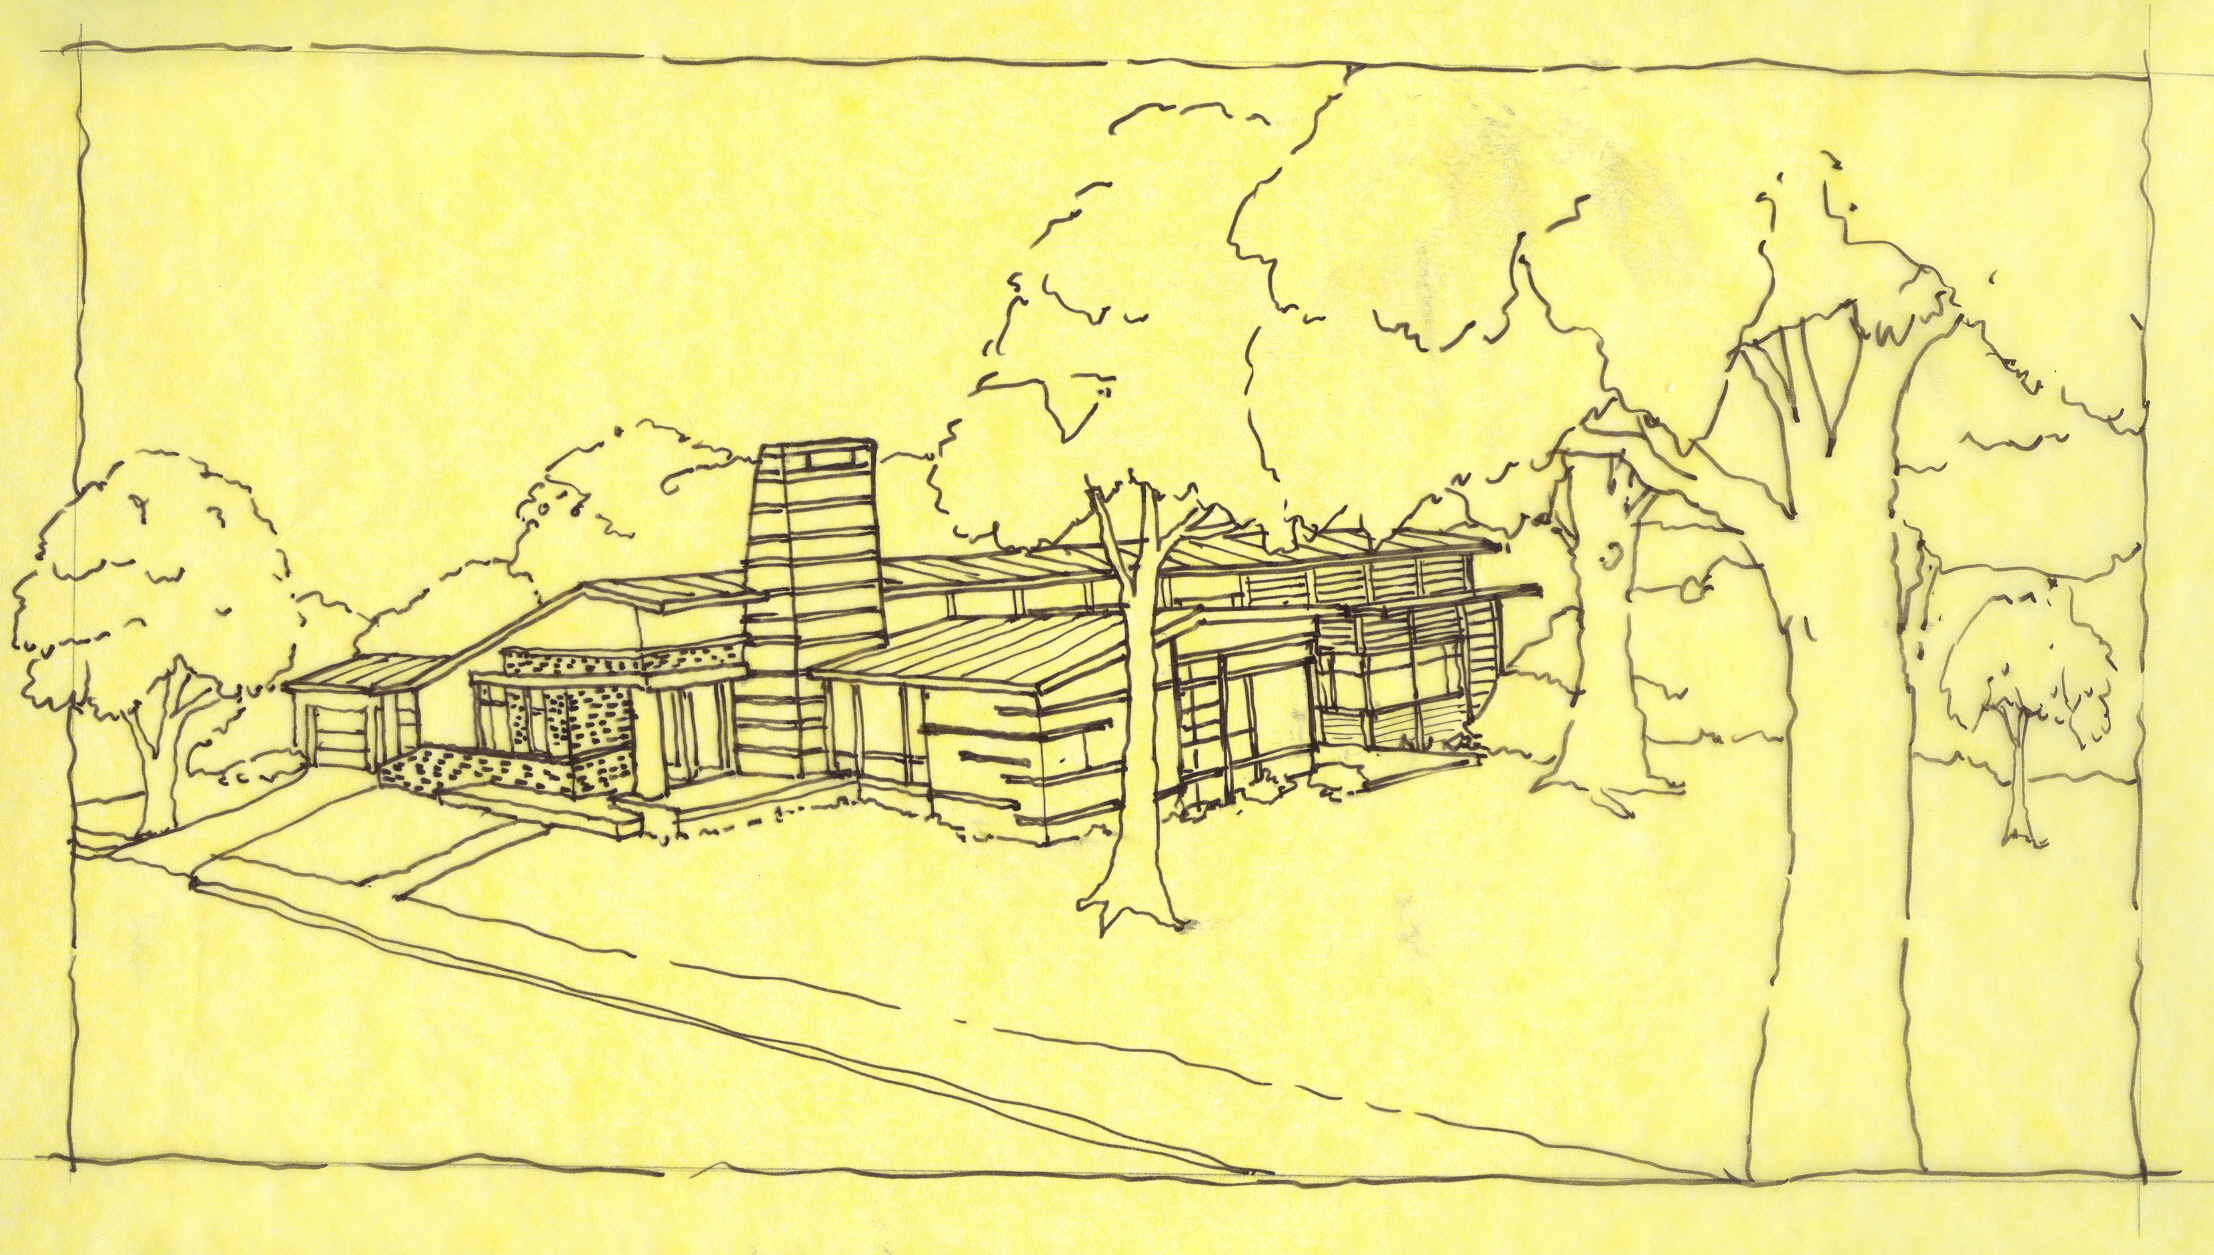 rectory perspective sketch.jpg